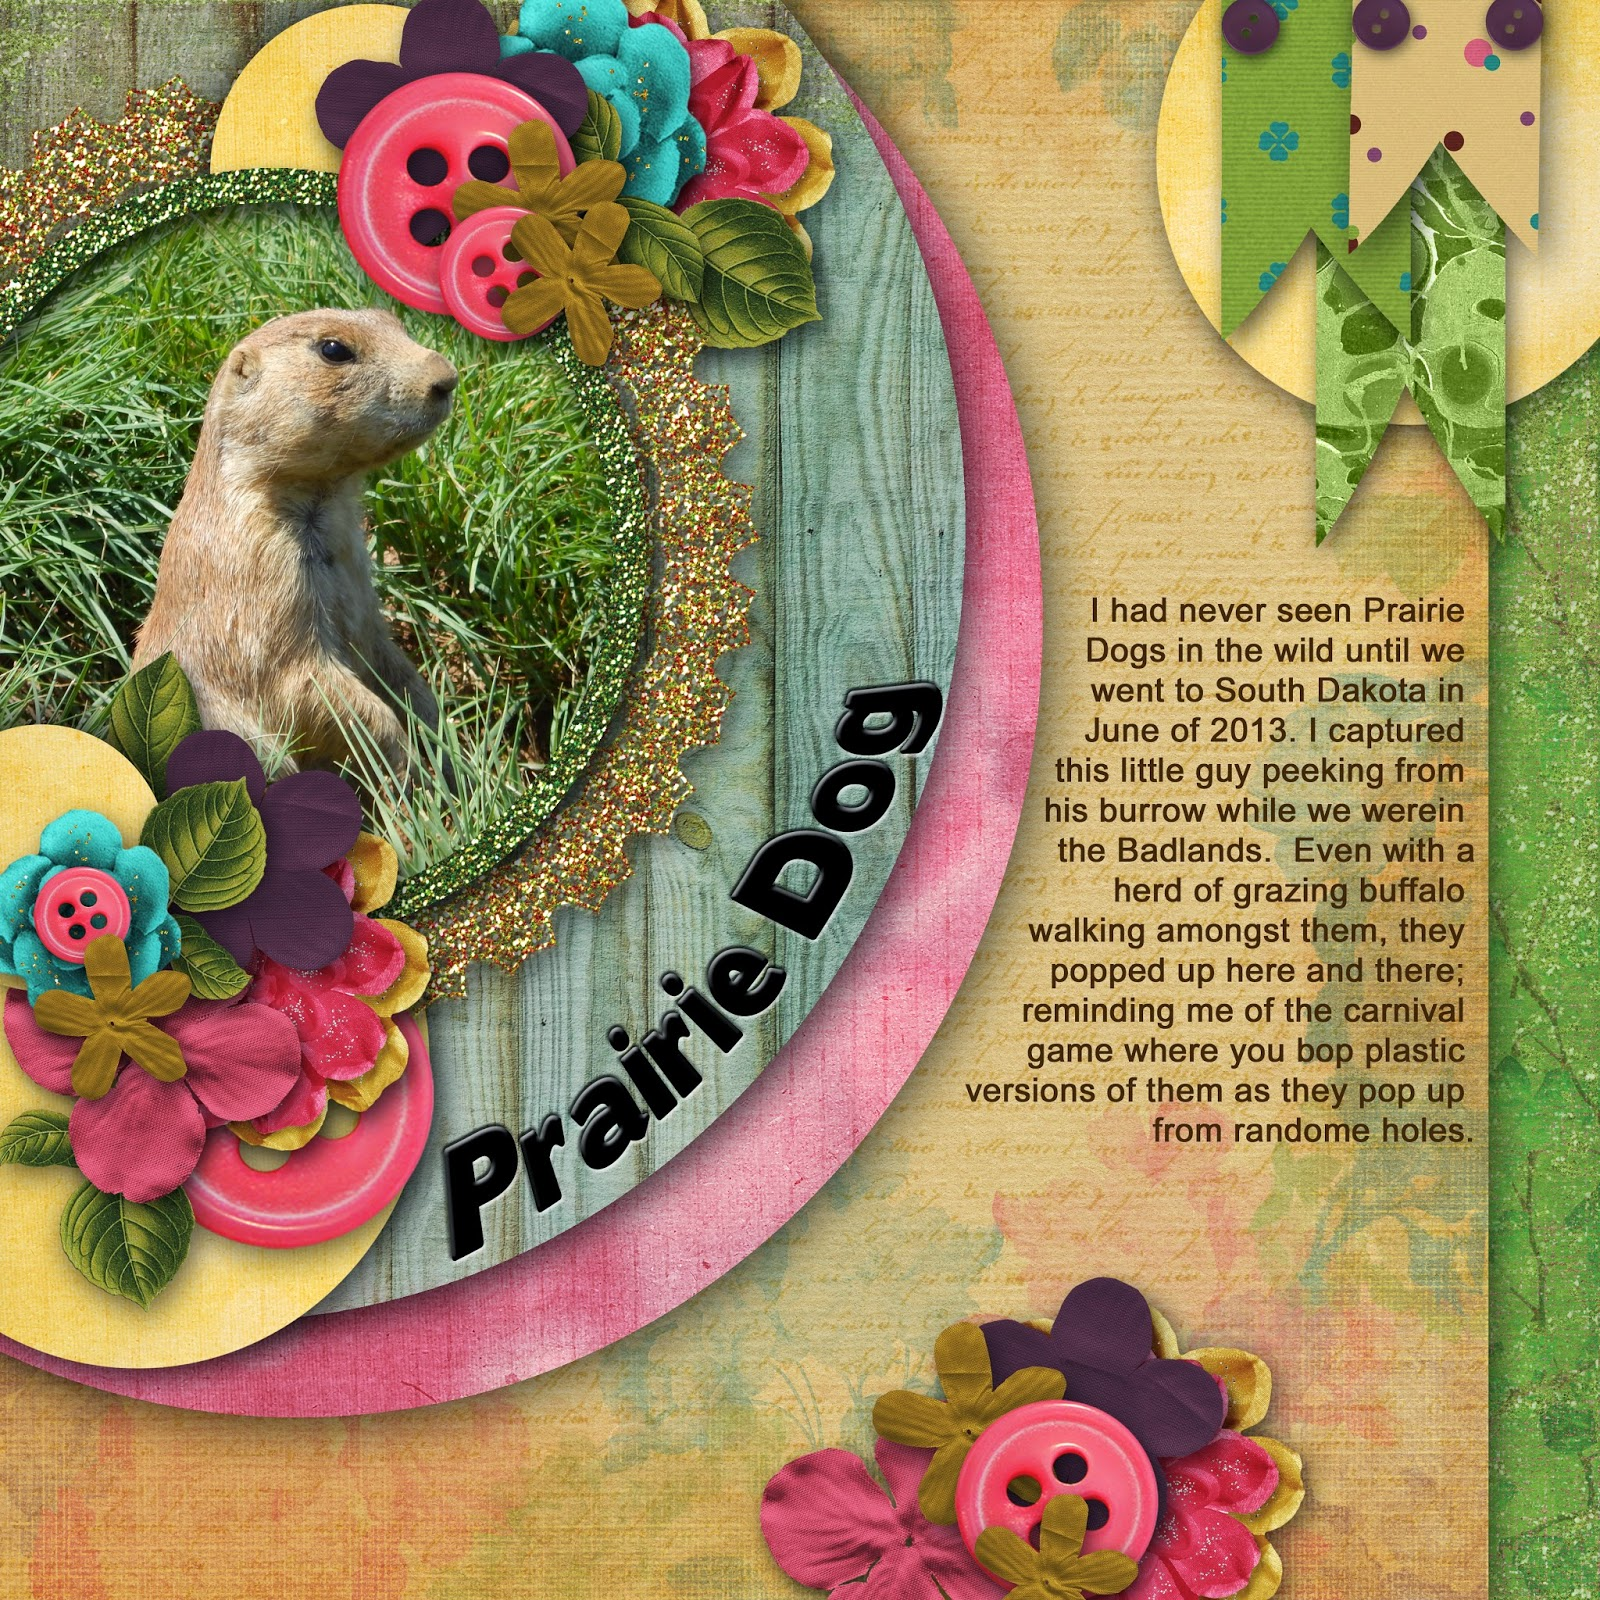 http://1.bp.blogspot.com/-f3NzTw04SbE/VCCKqblxKxI/AAAAAAAAA2c/9_NTDZlnVLA/s1600/Prairie%2BDog.jpg